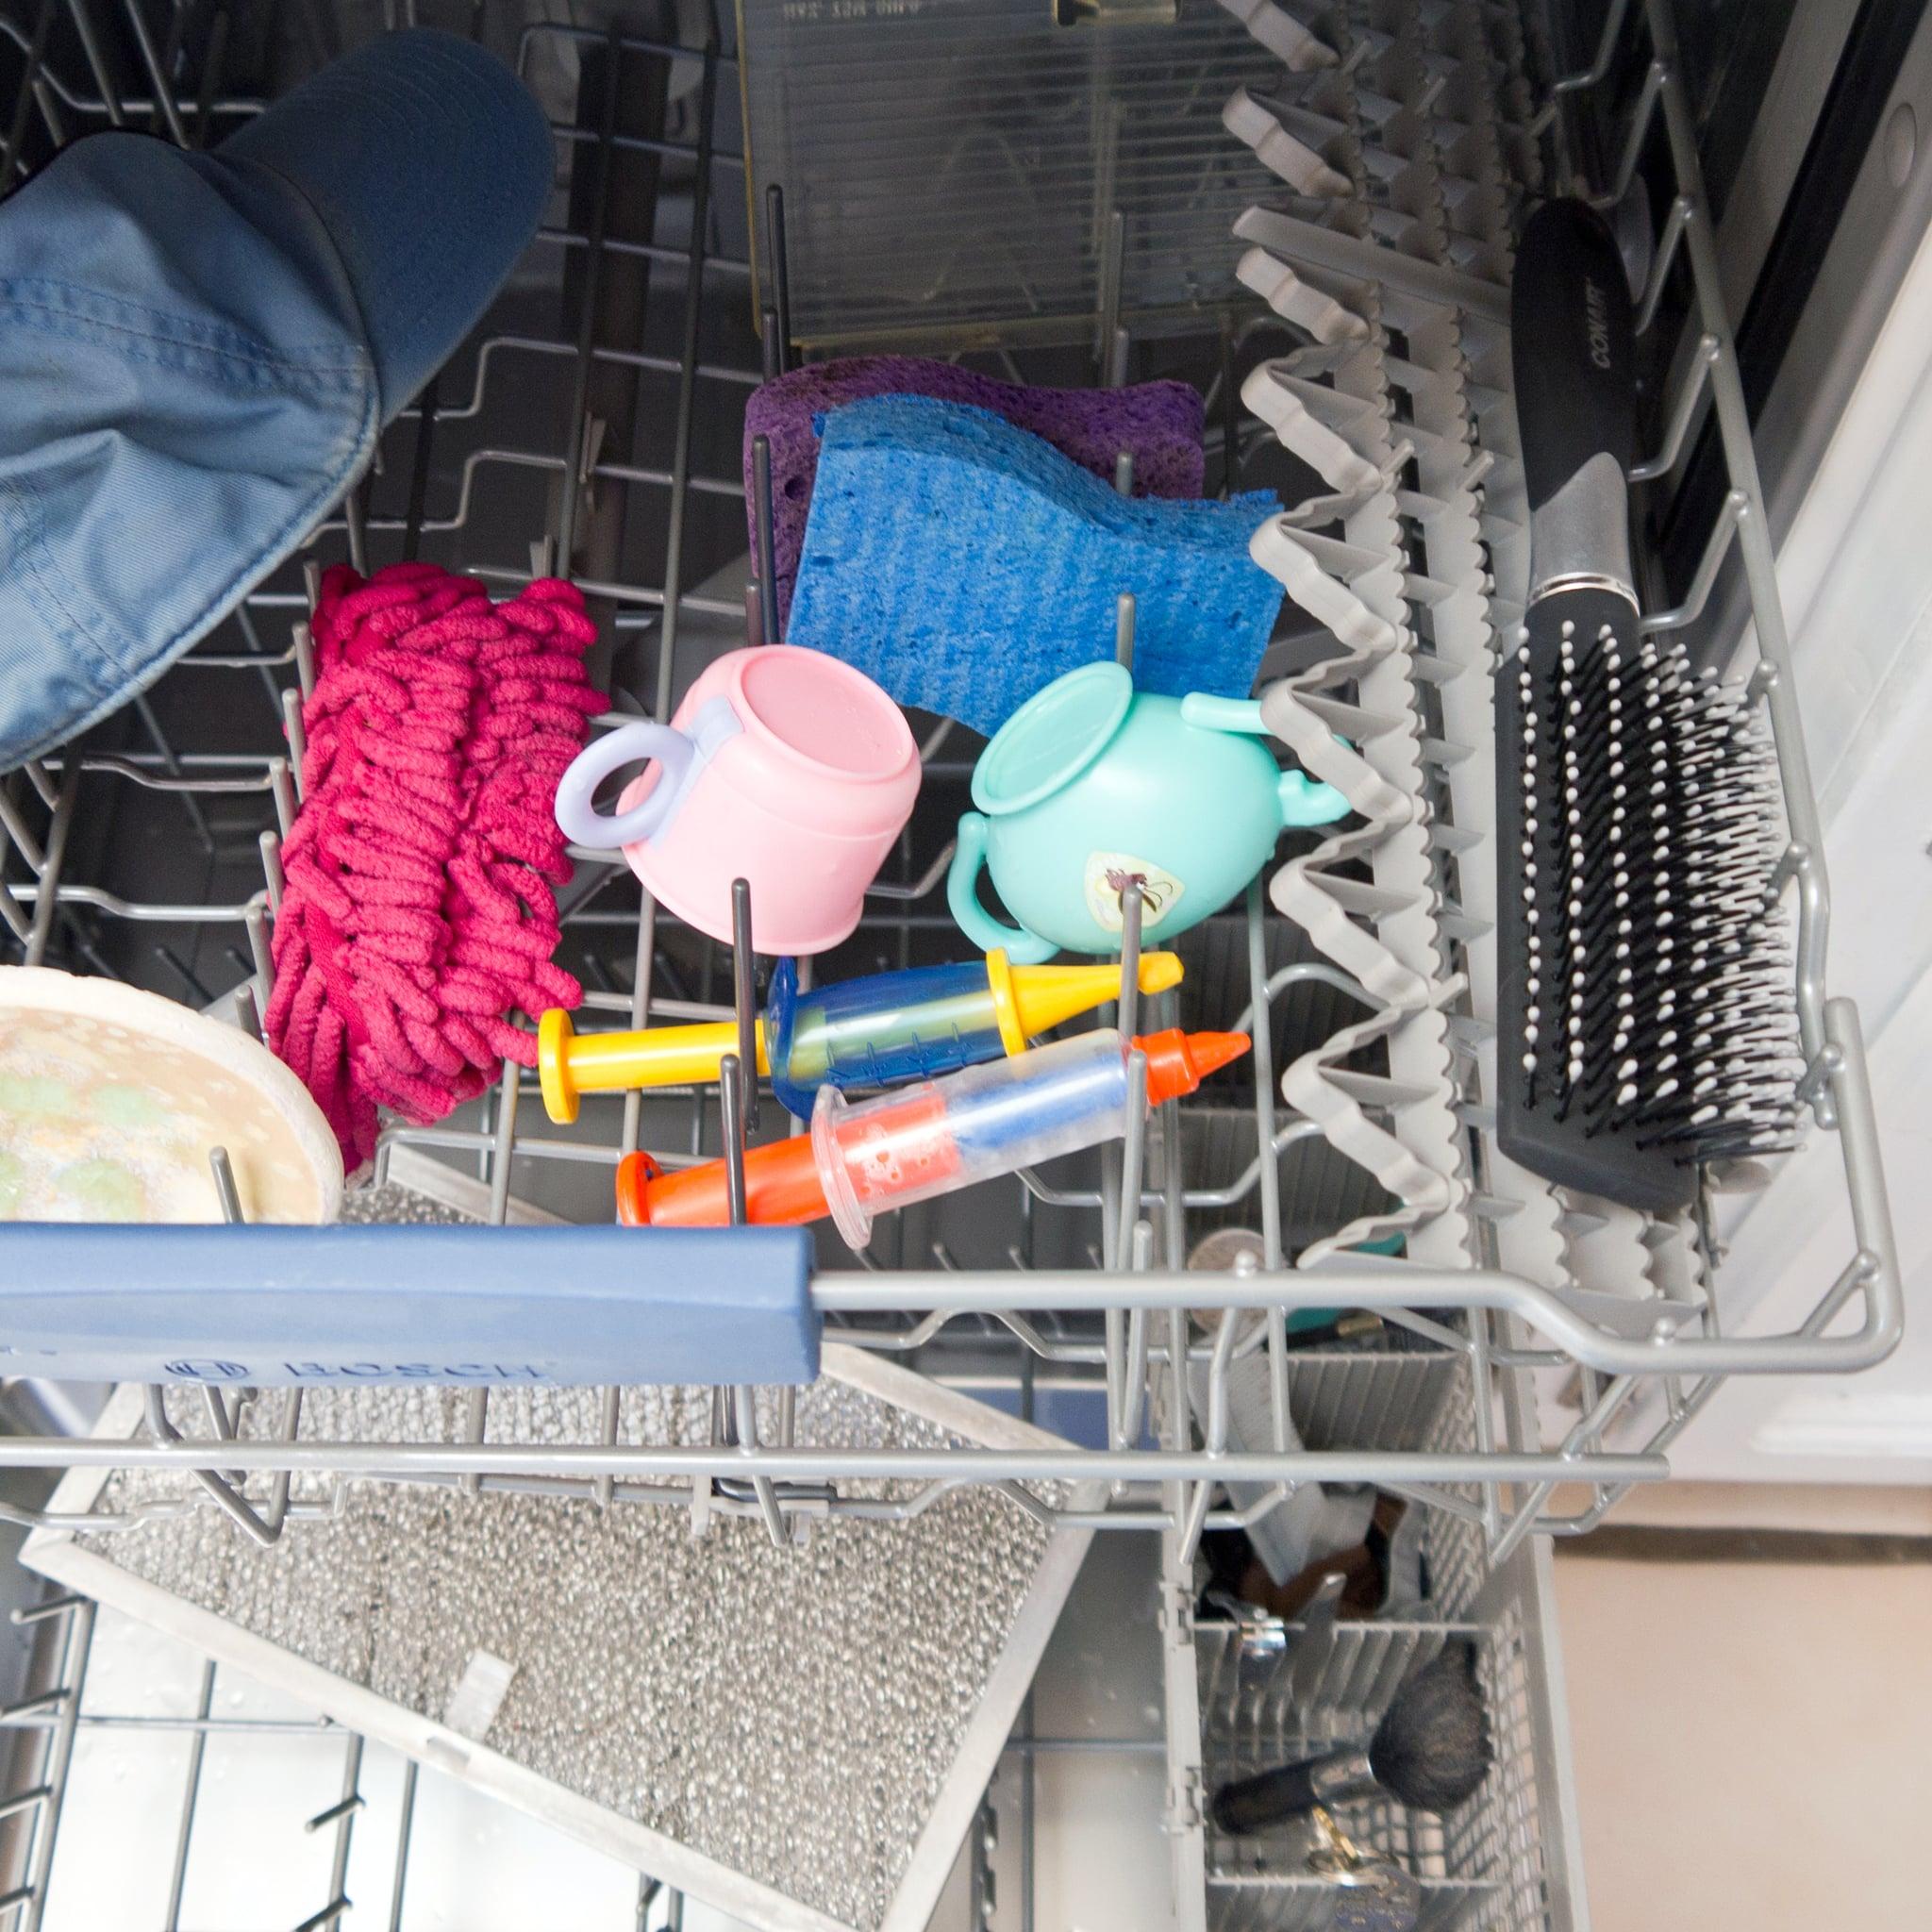 Makeup brushes dishwasher